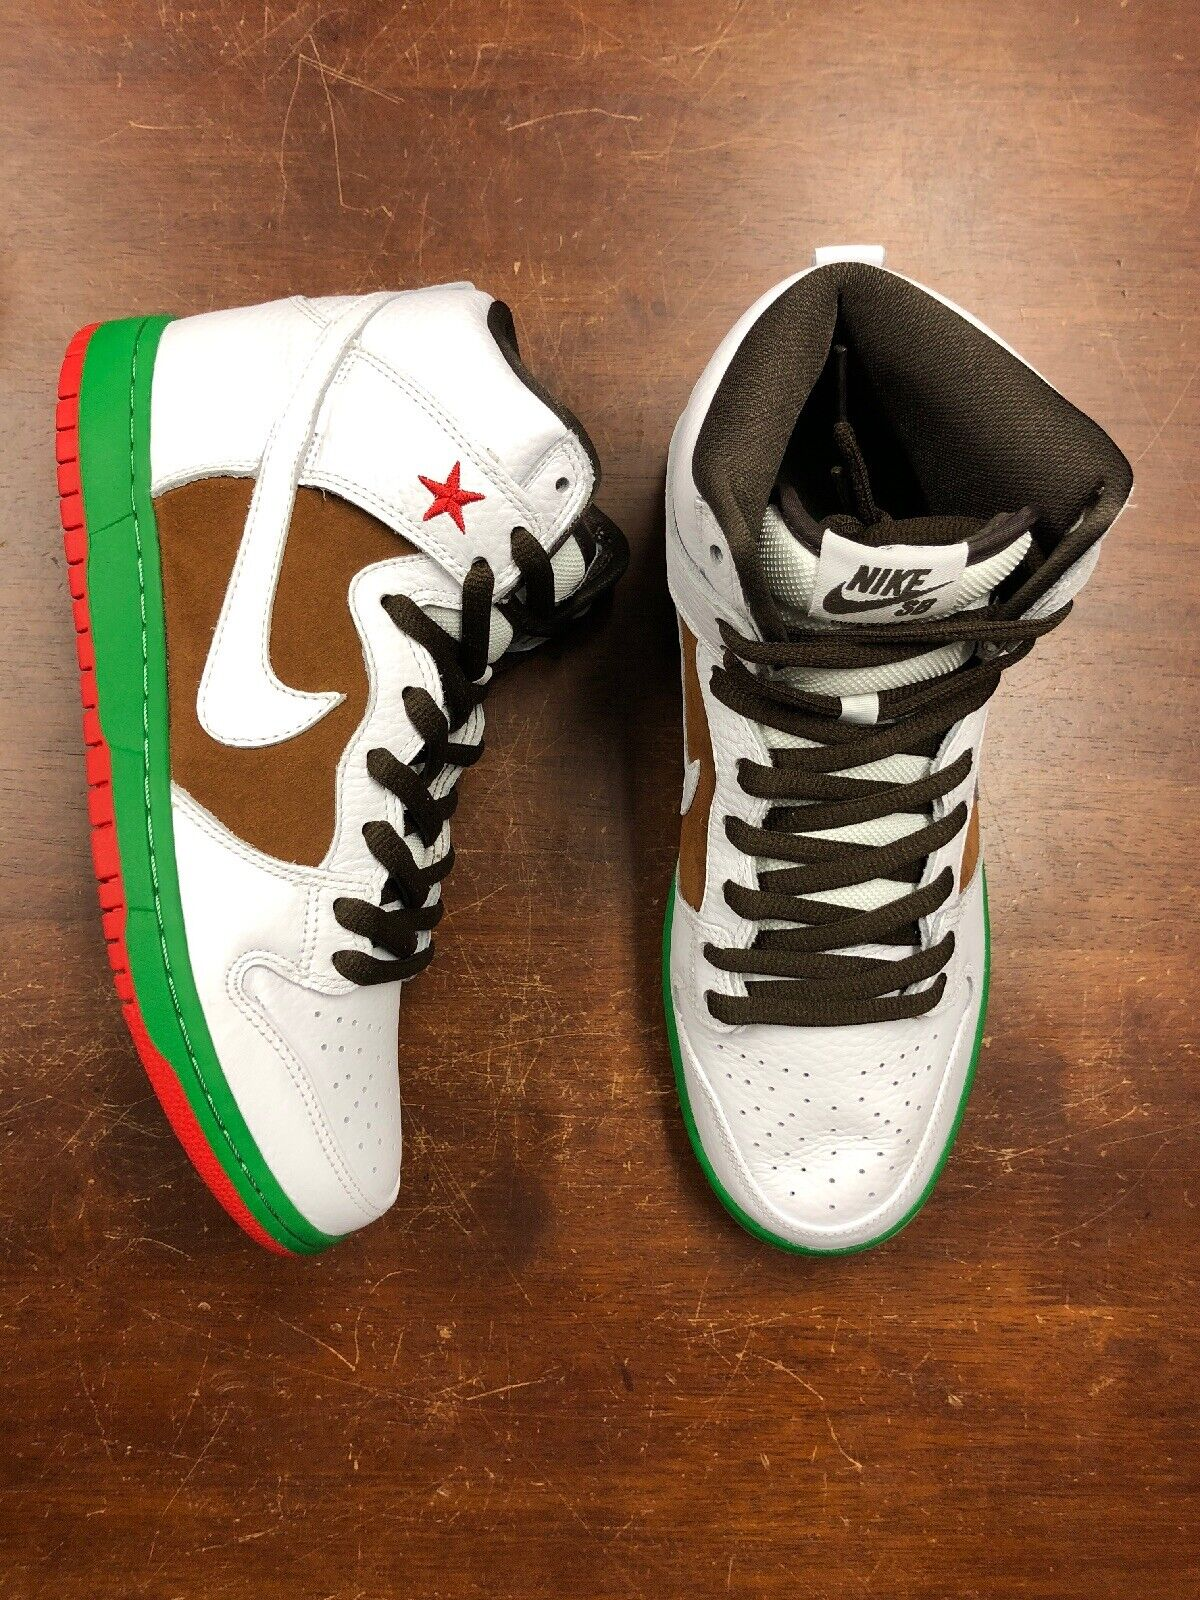 Nike SB Dunk High Cali Mens Sz 9.5 NIB